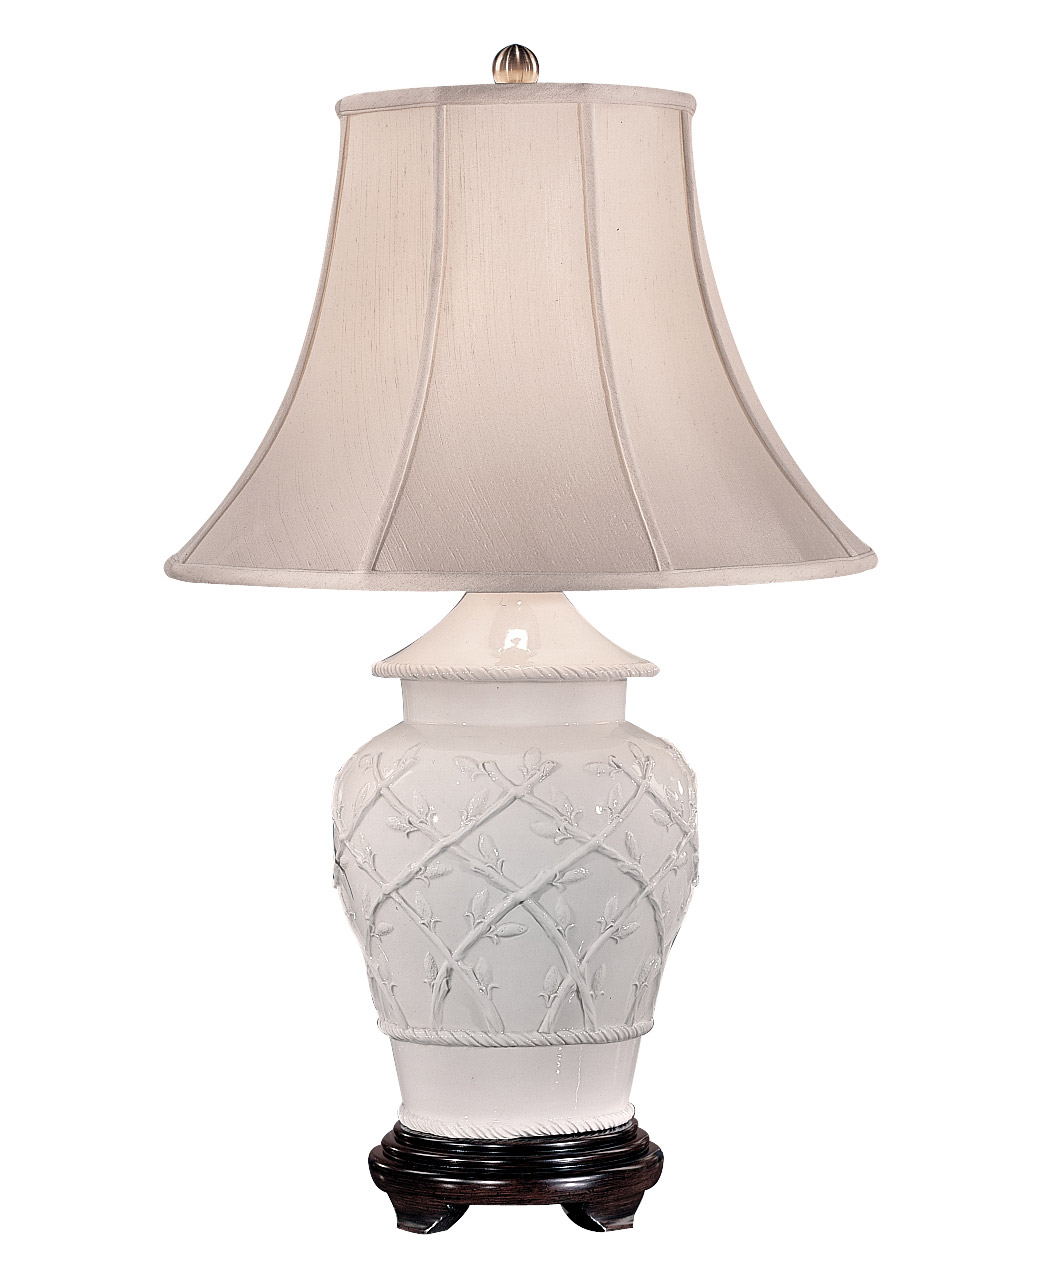 Wildwood 620 China Today Table Lamp